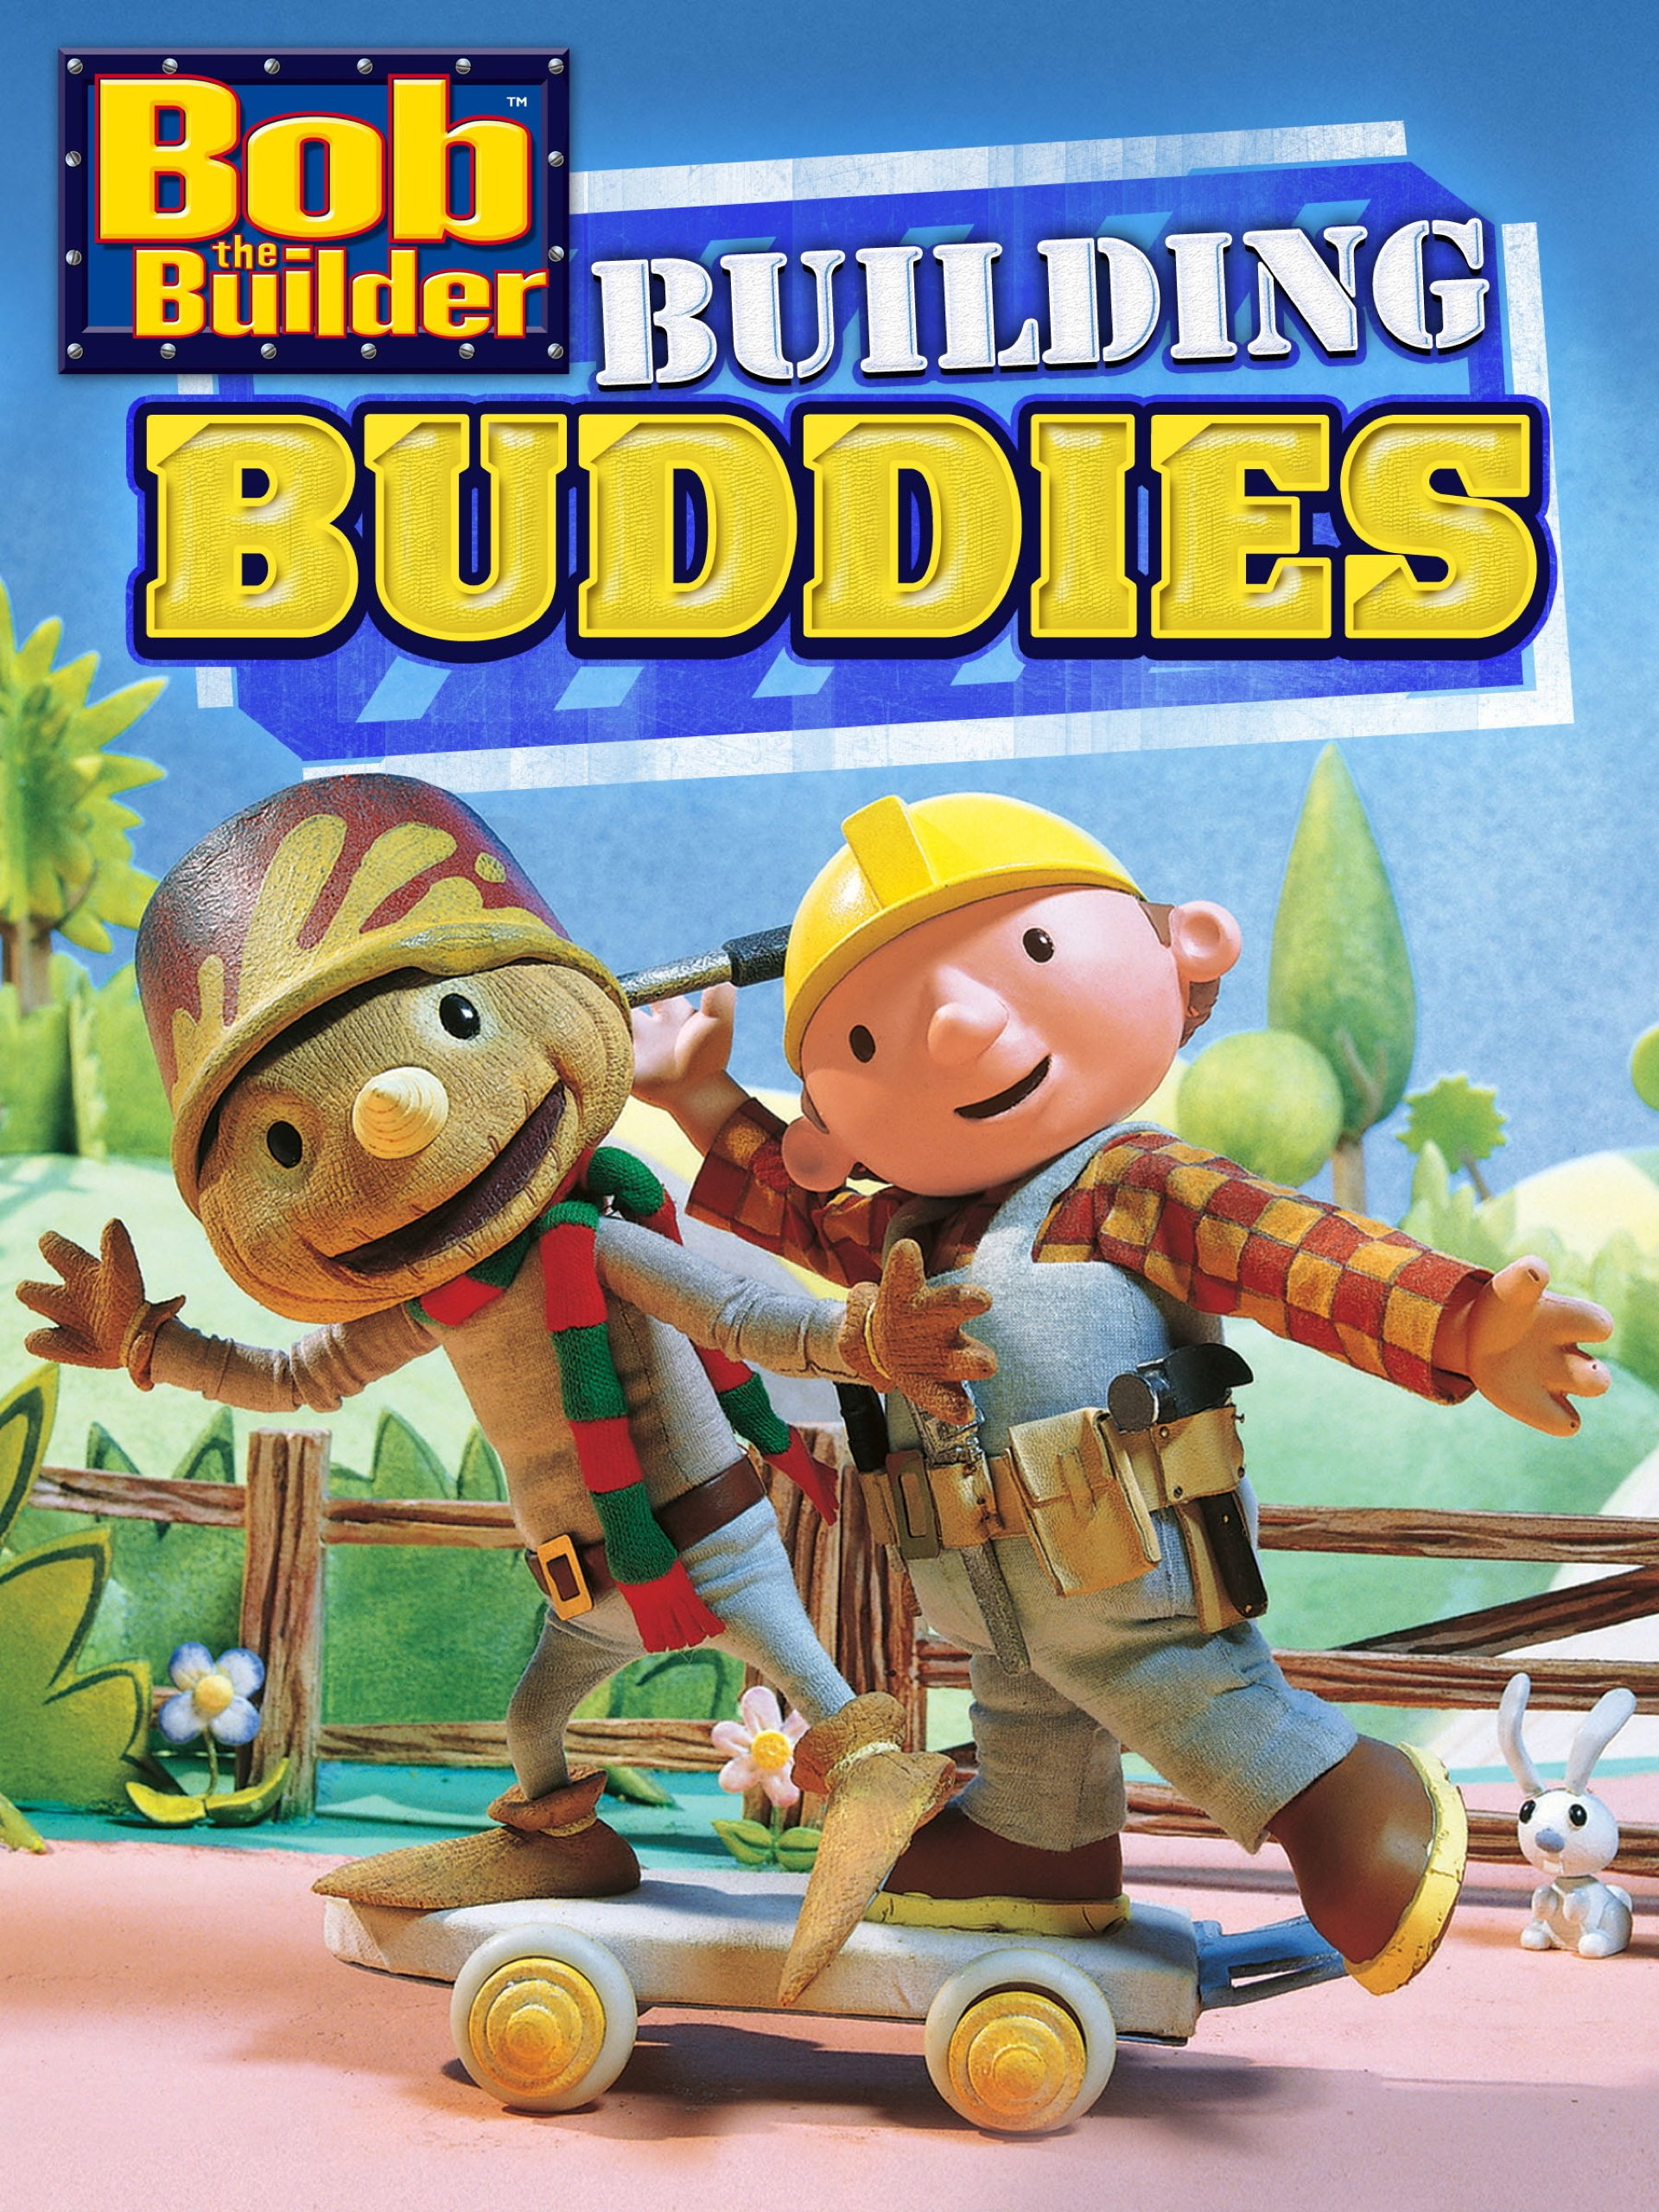 Bob the builder live online dvd rental - Bob The Builder Building Buddies